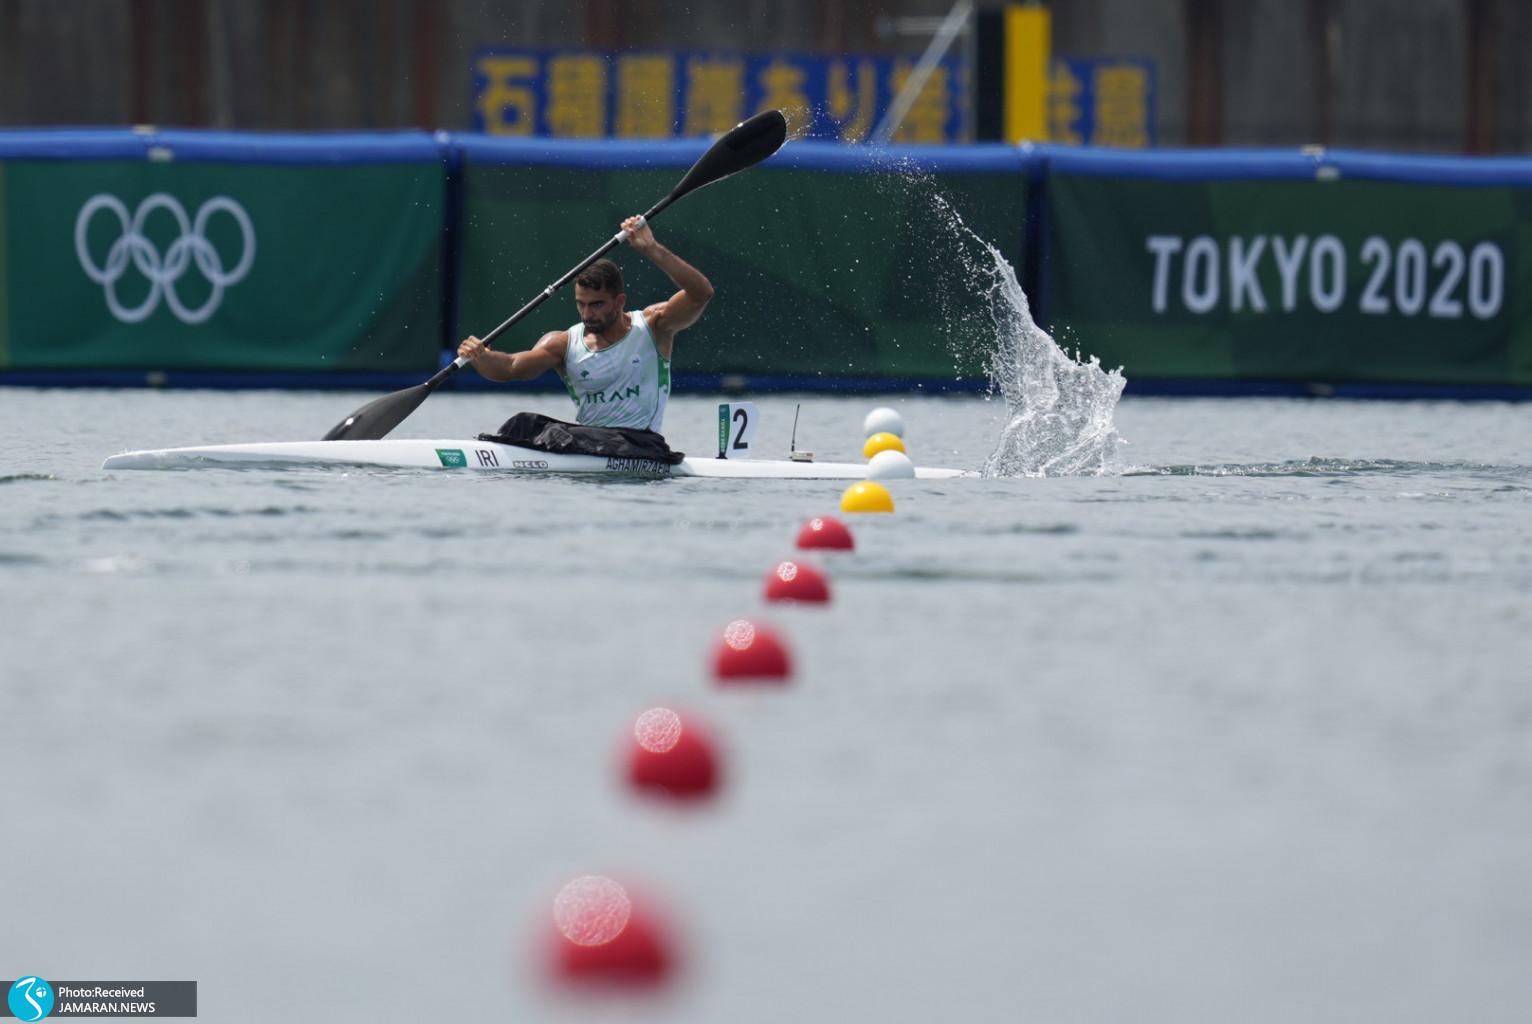 علی آقامیرزایی قایقرانی المپیک